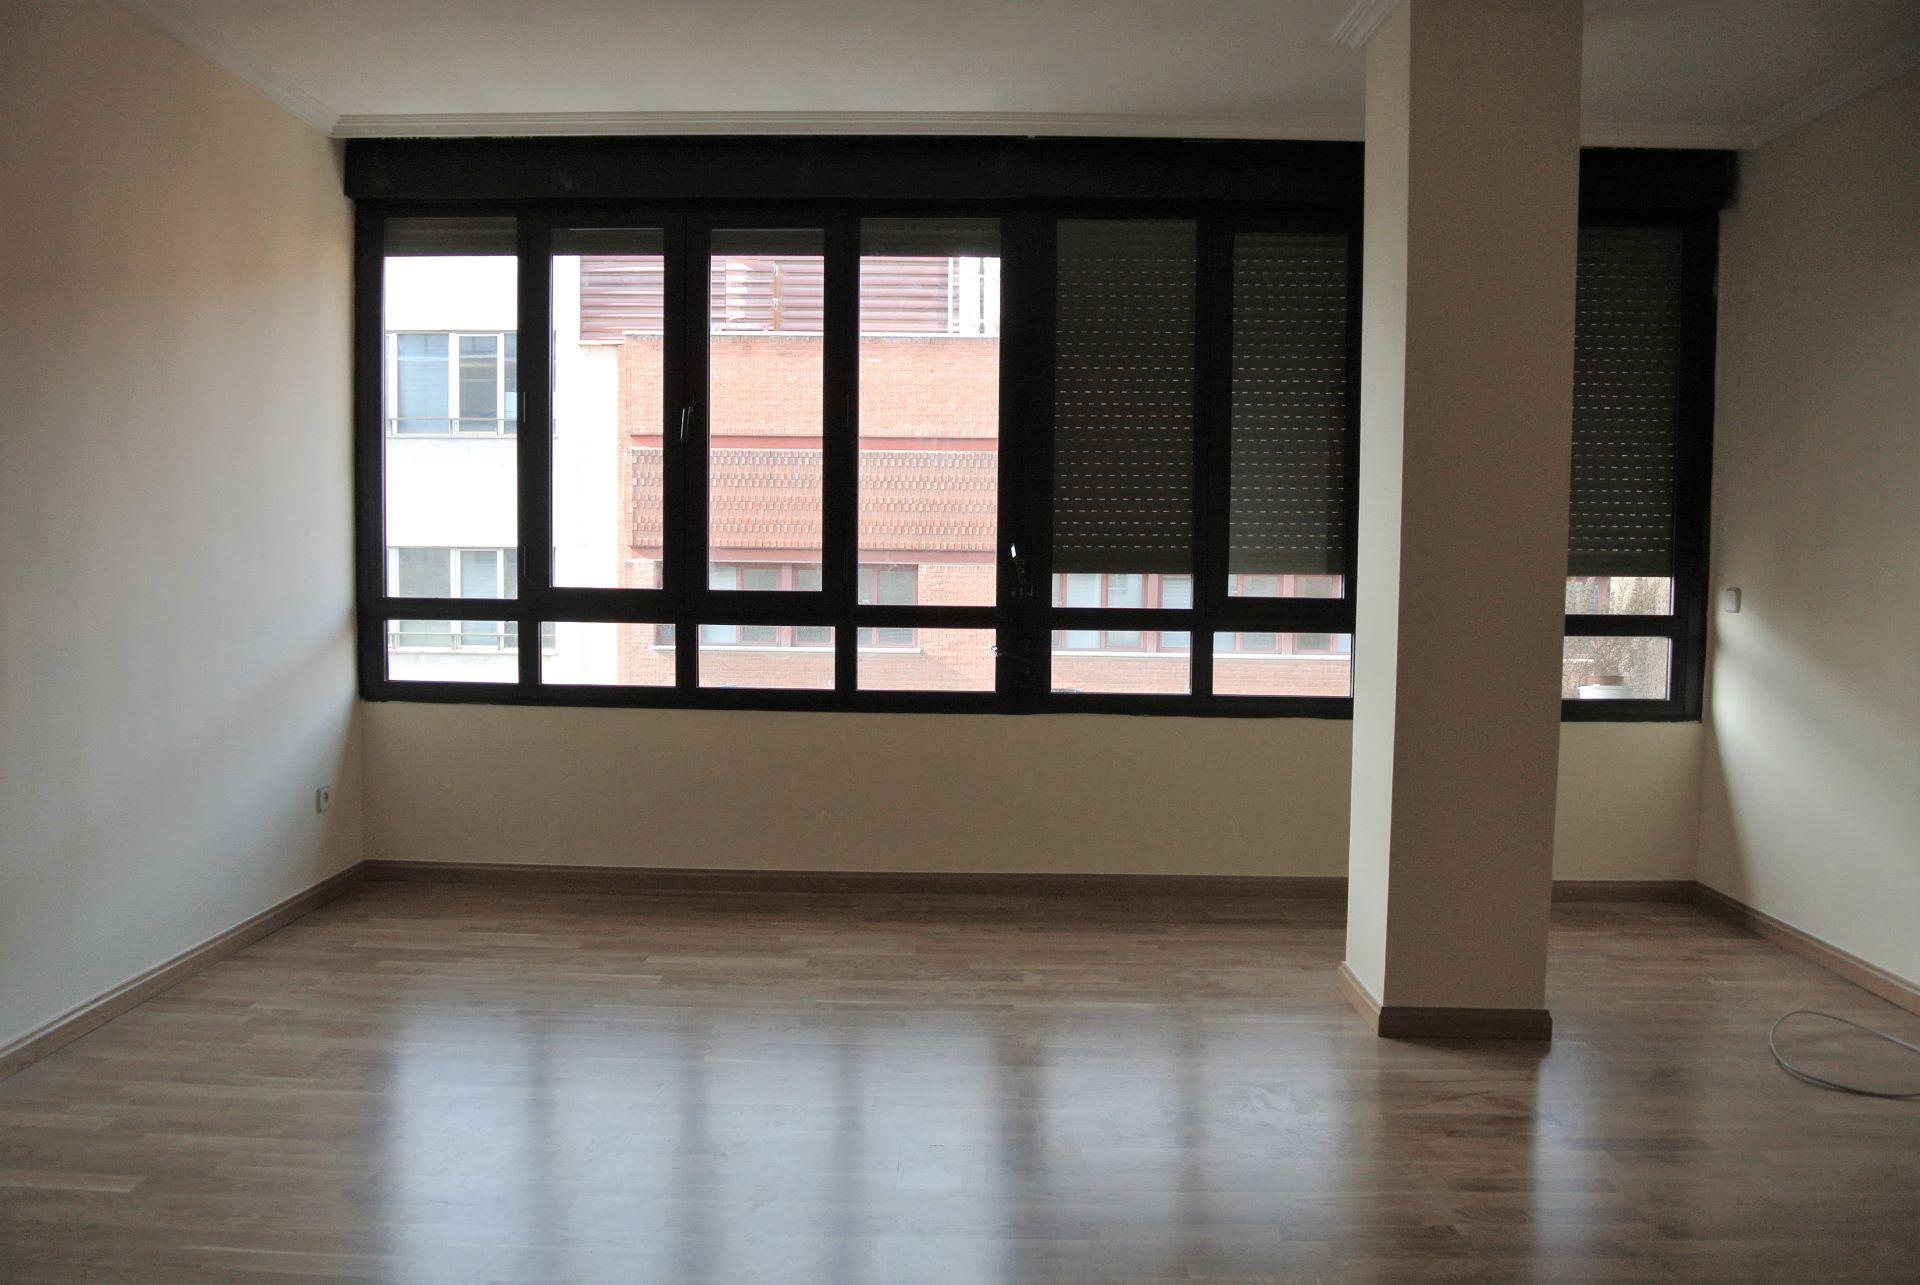 Piso en Madrid, Tetuan, alquiler